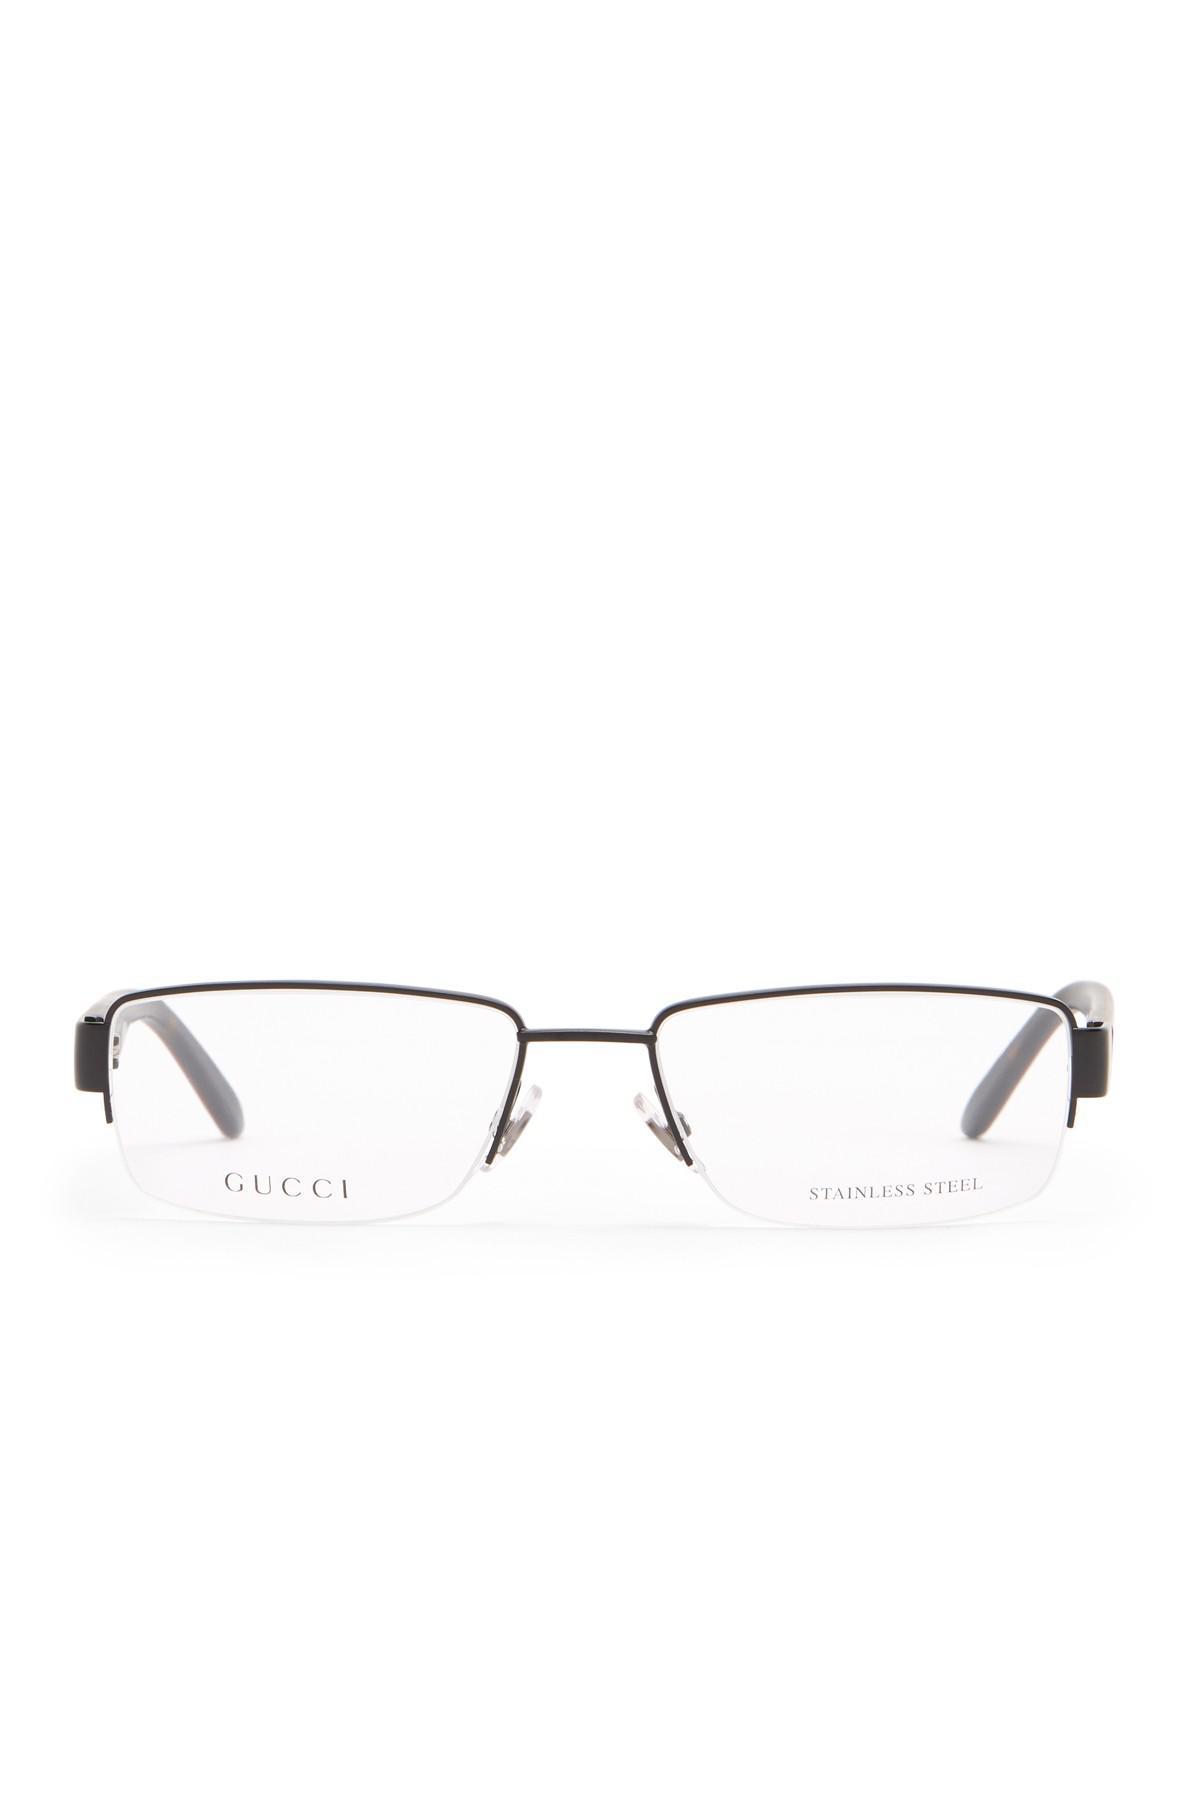 8fa50ee09b5 Lyst - Gucci 53mm Semi-rimless Rectangular Optical Frames in Brown